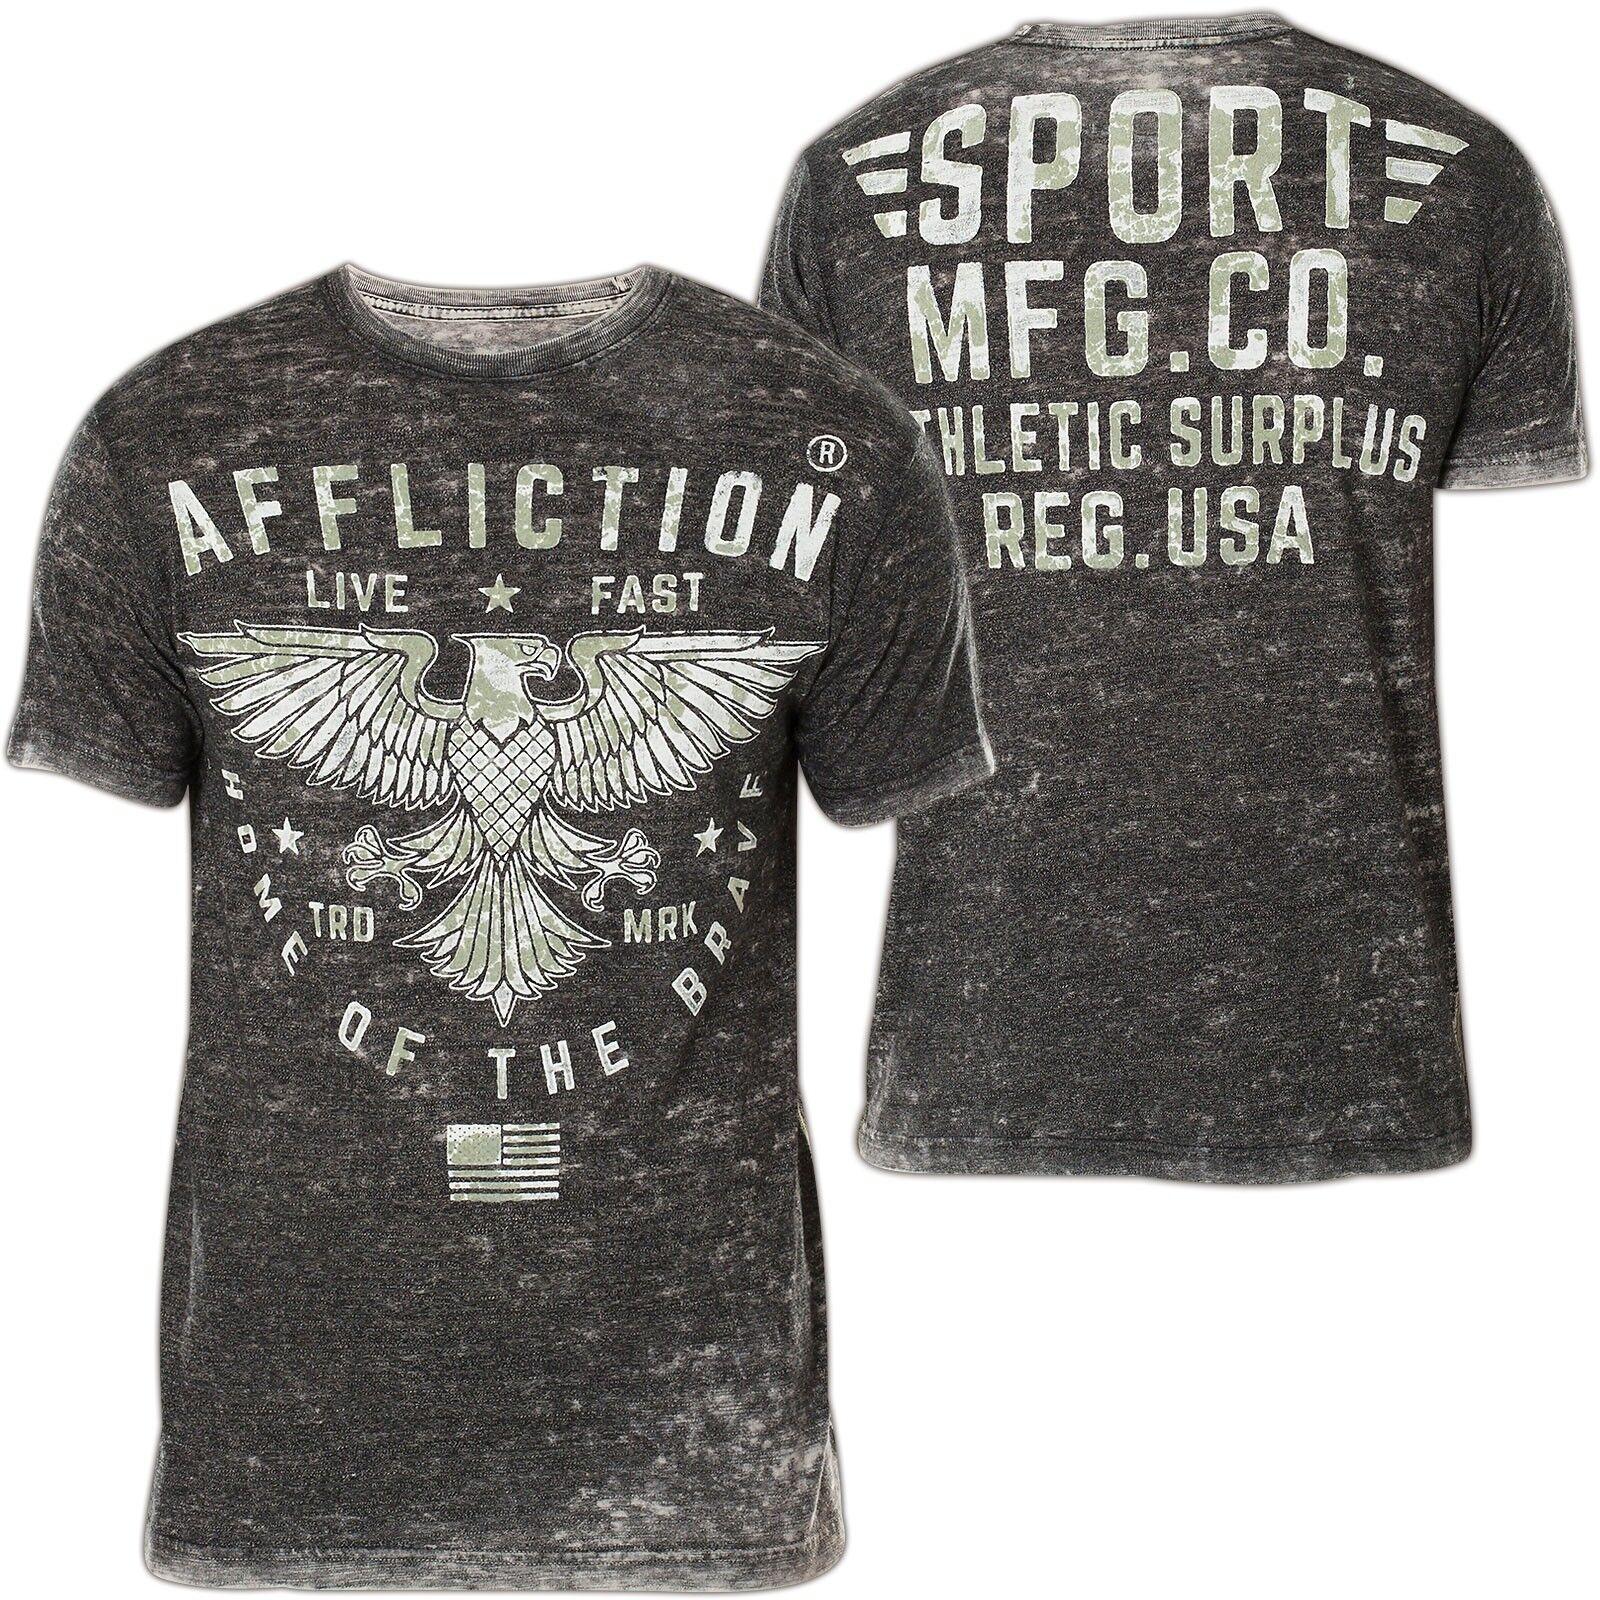 AFFLICTION T-Shirt Standard Athletics Grau T-Shirts Herren